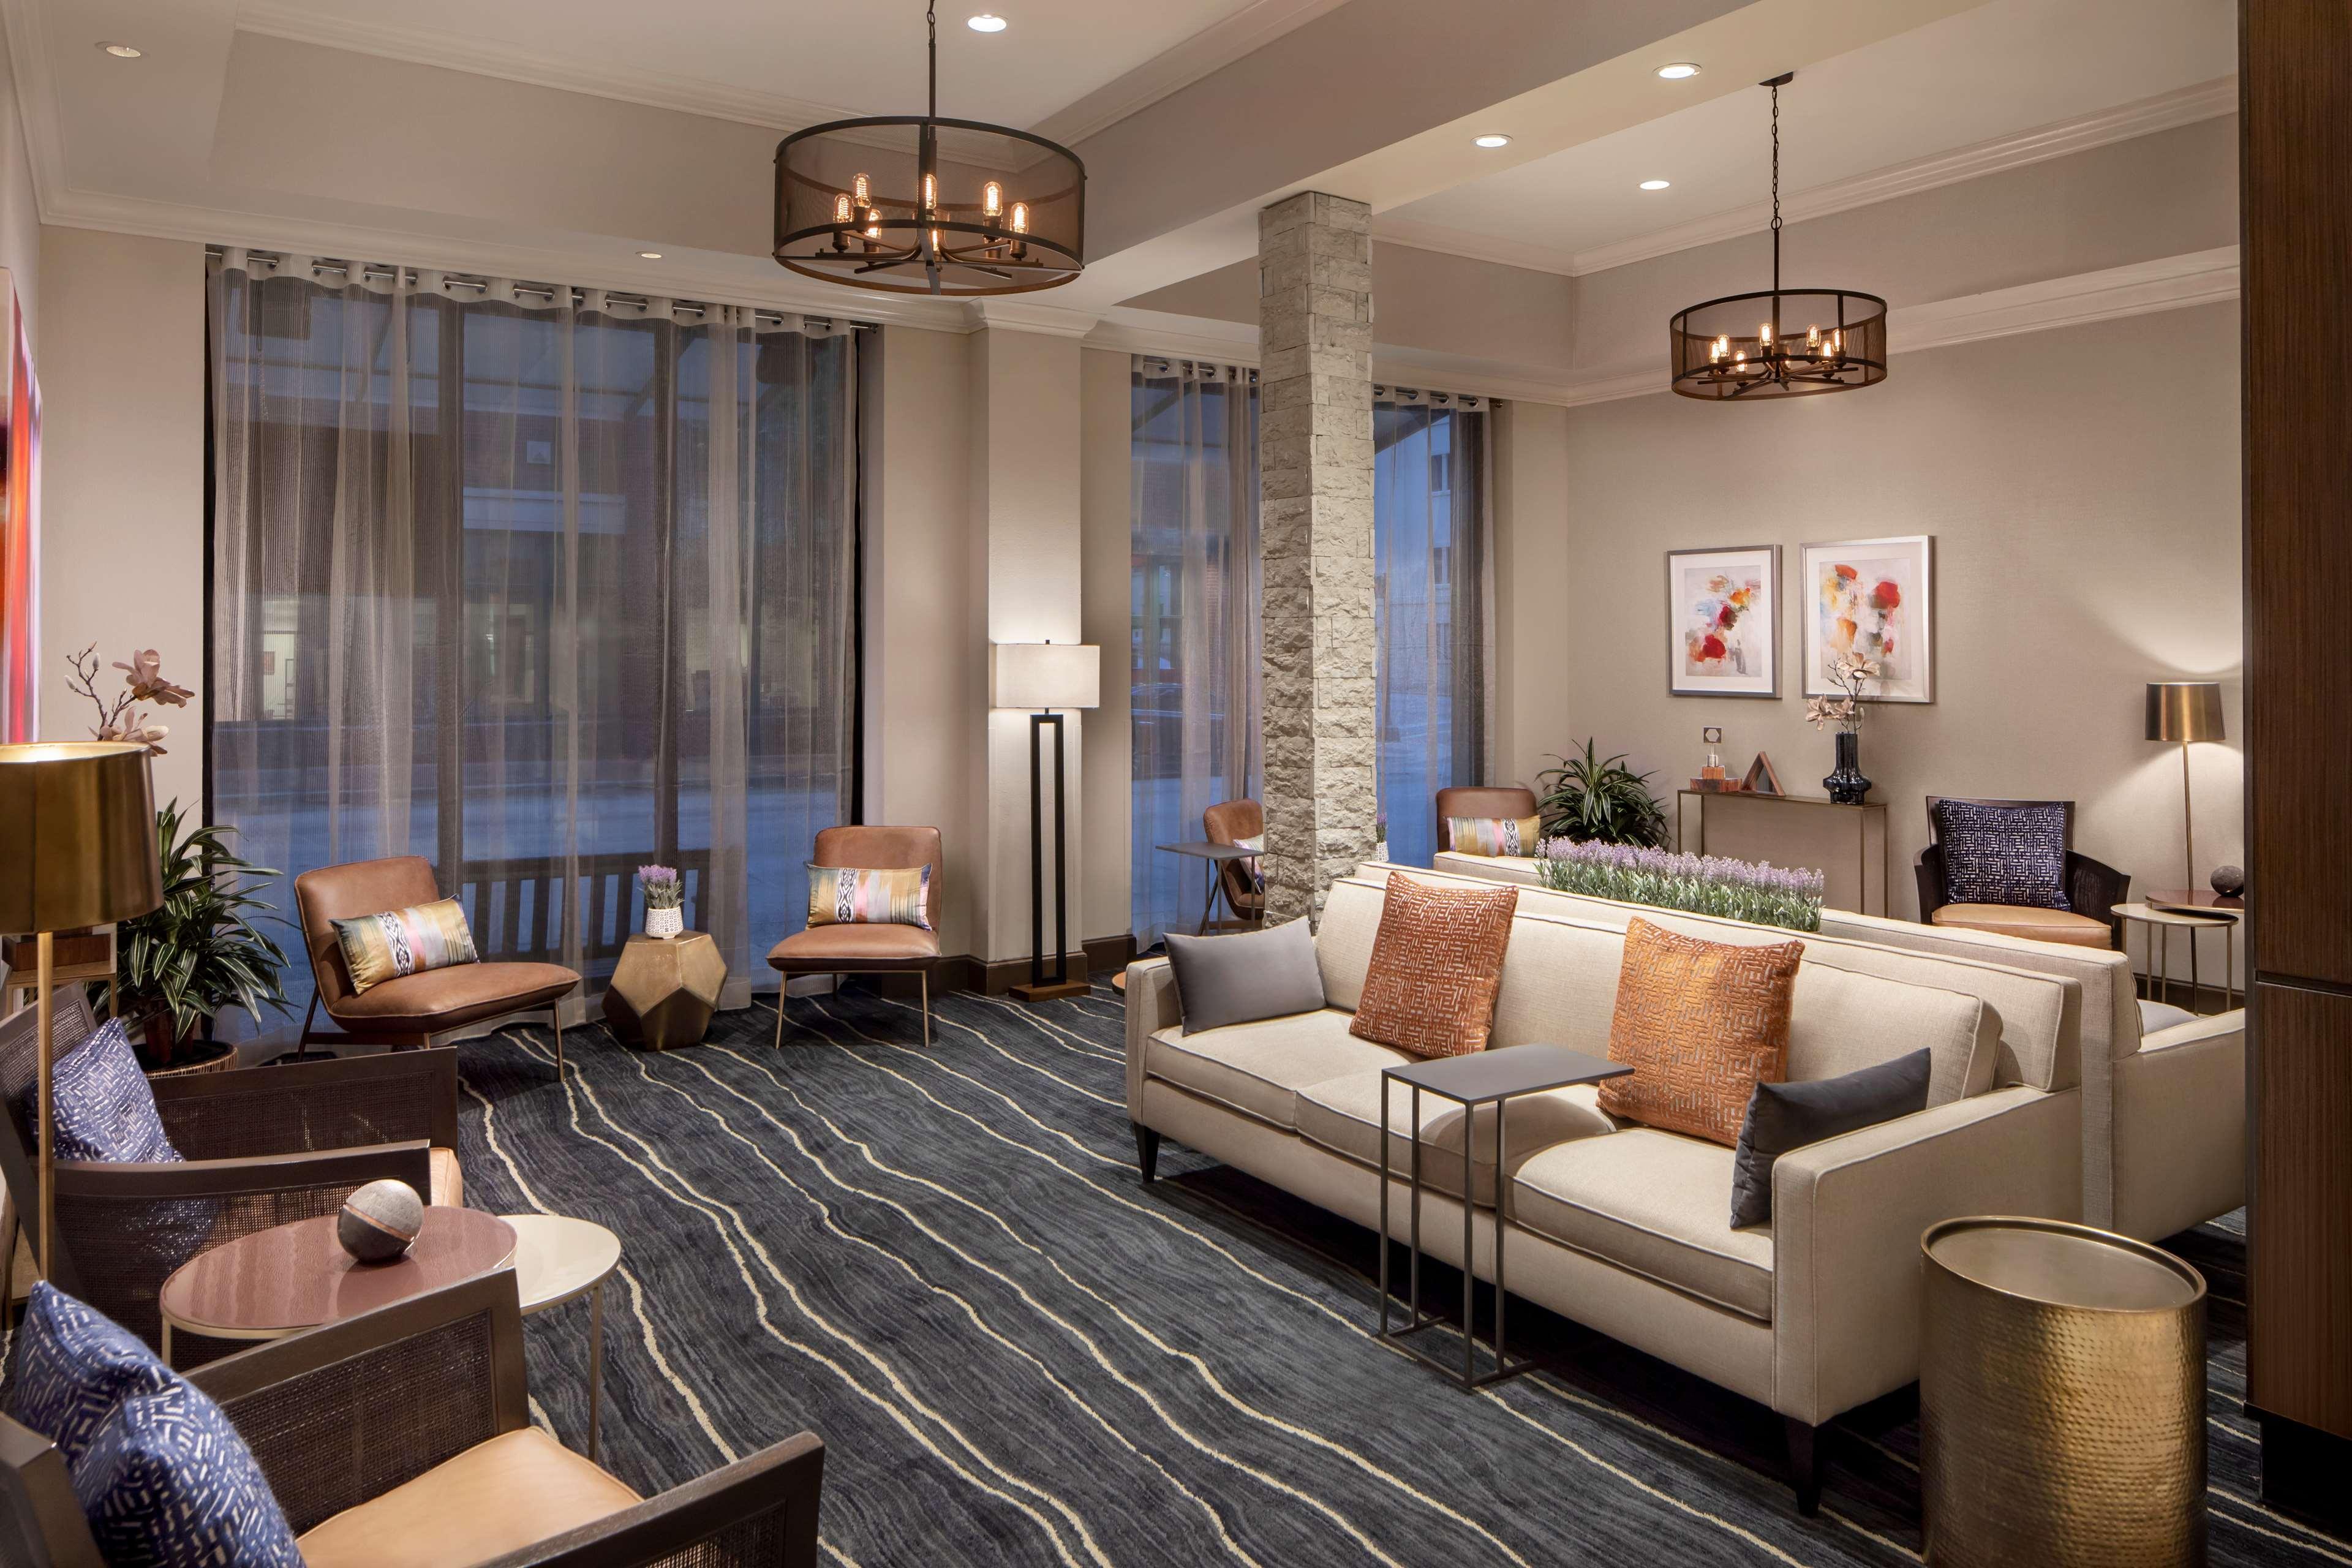 embassy suites by hilton fort worth downtown fort worth. Black Bedroom Furniture Sets. Home Design Ideas